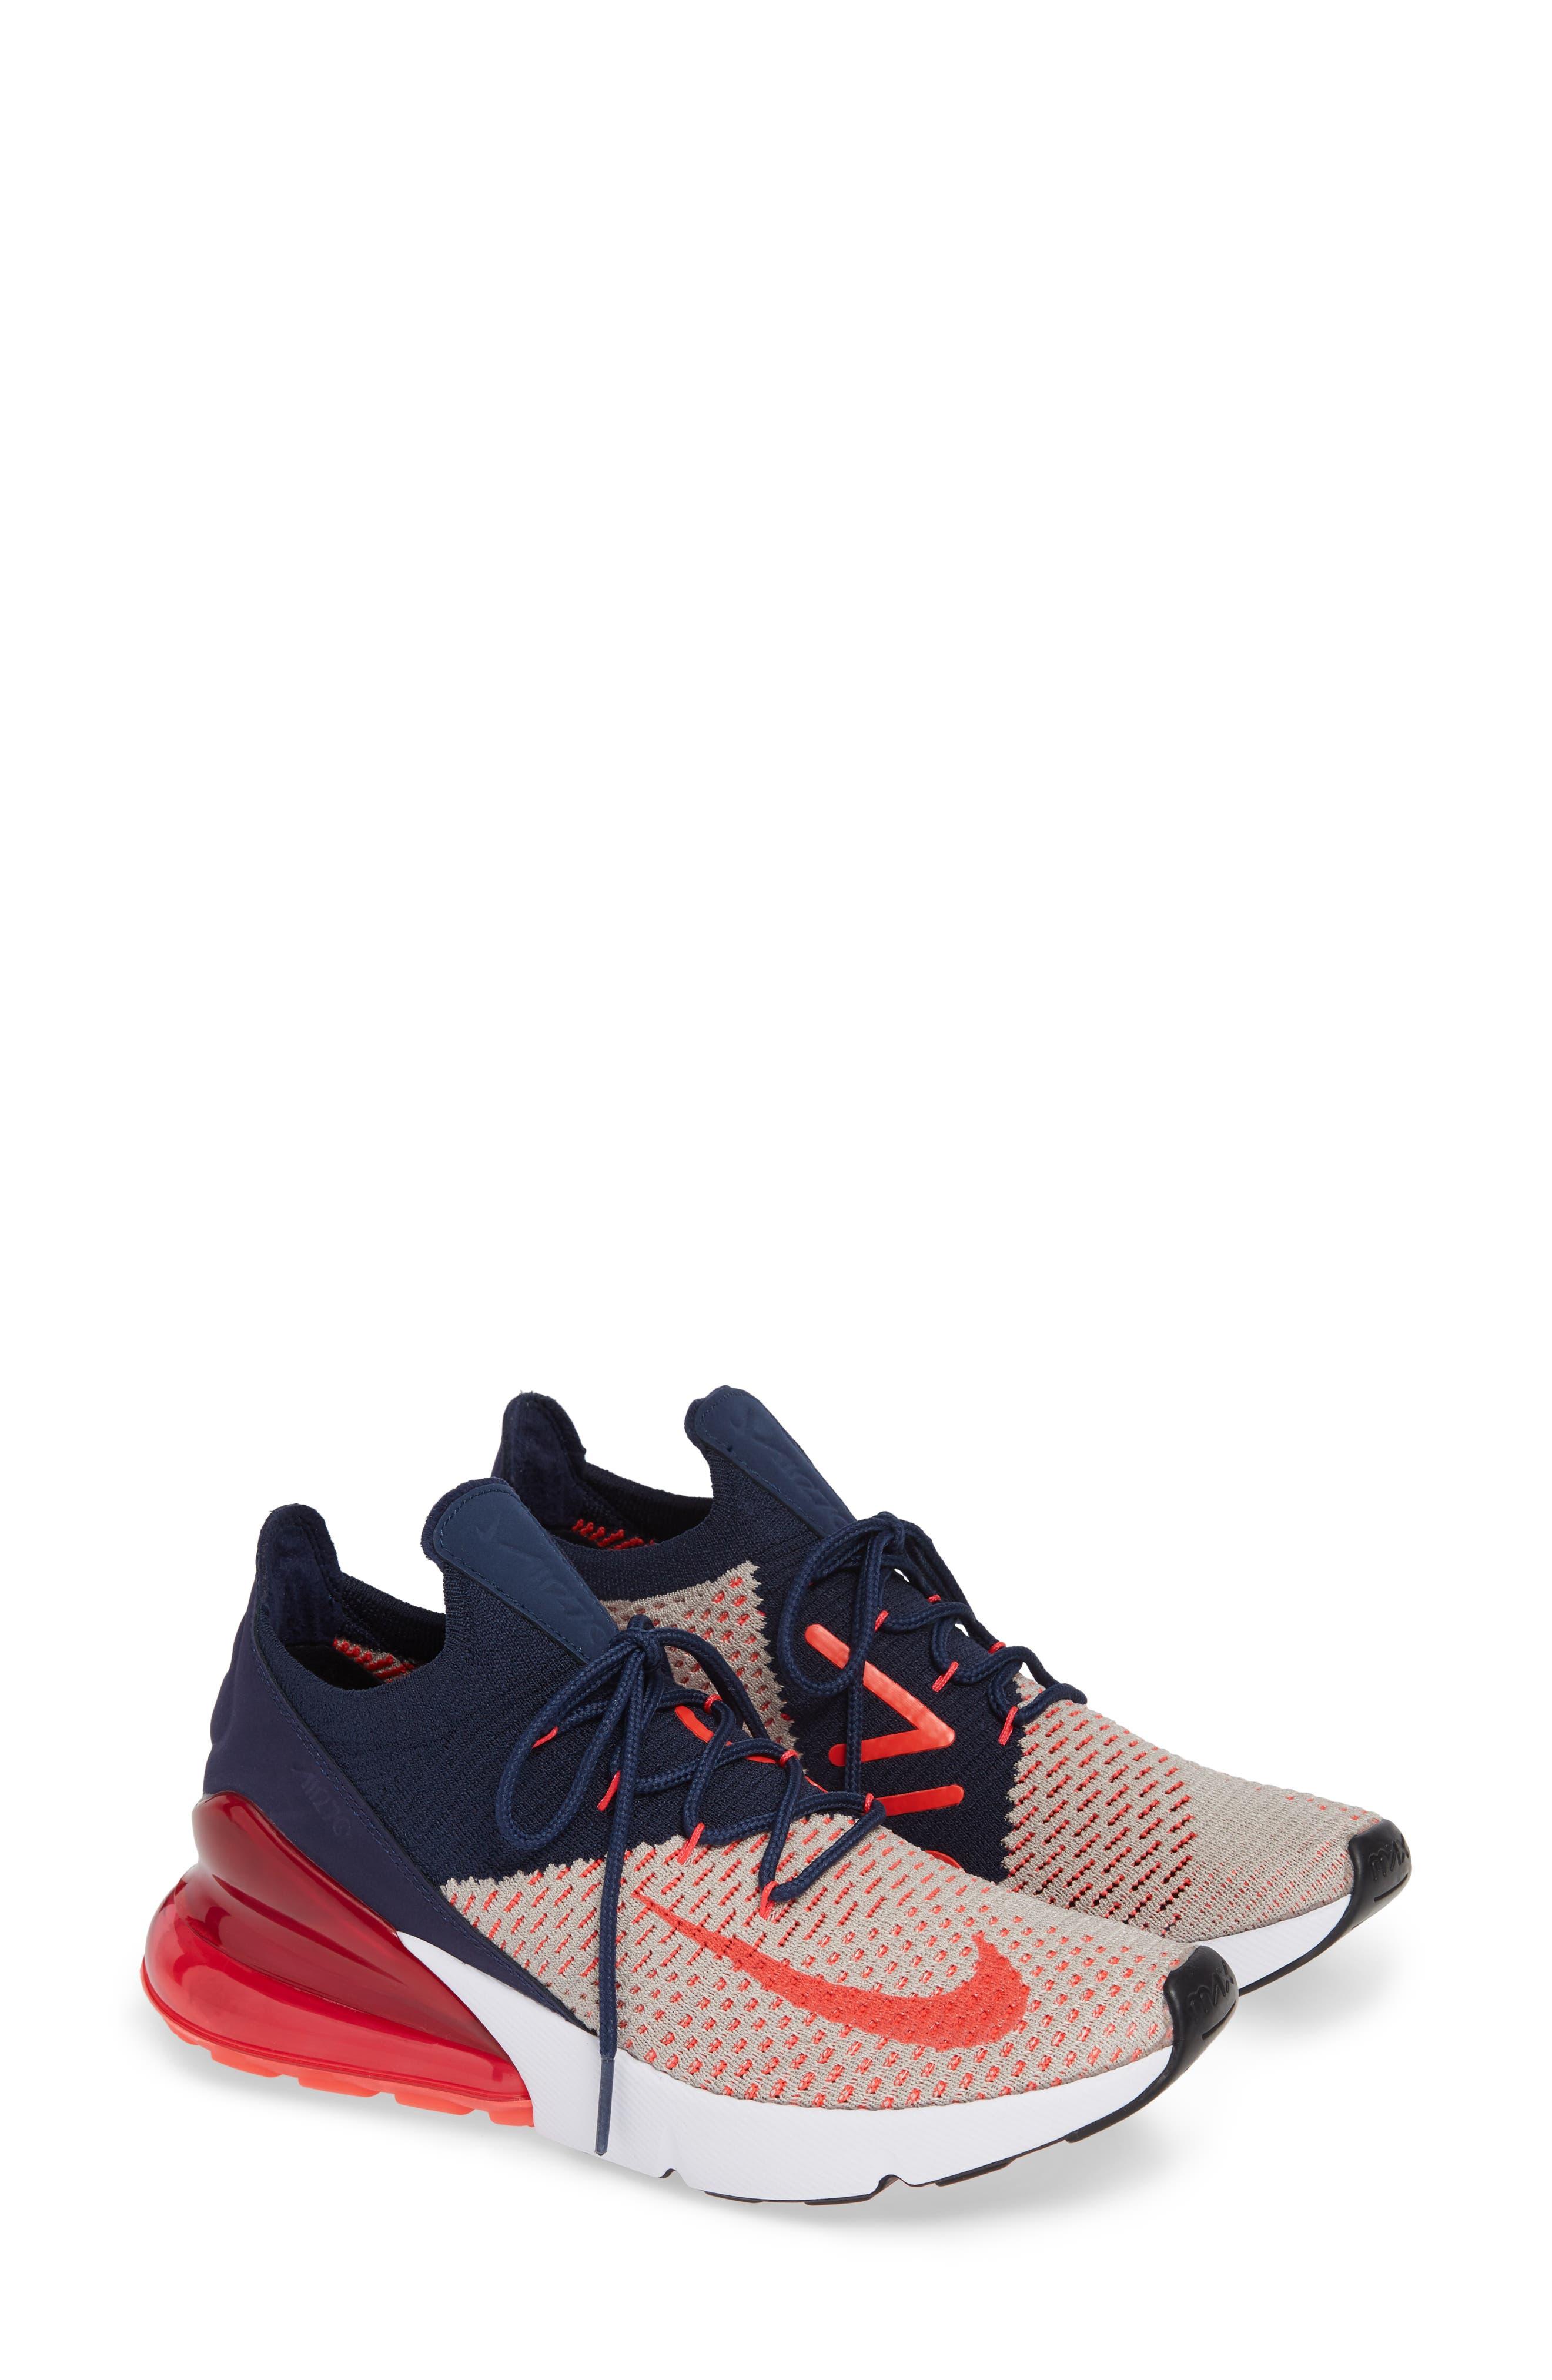 Air Max 270 Flyknit Sneaker,                             Alternate thumbnail 13, color,